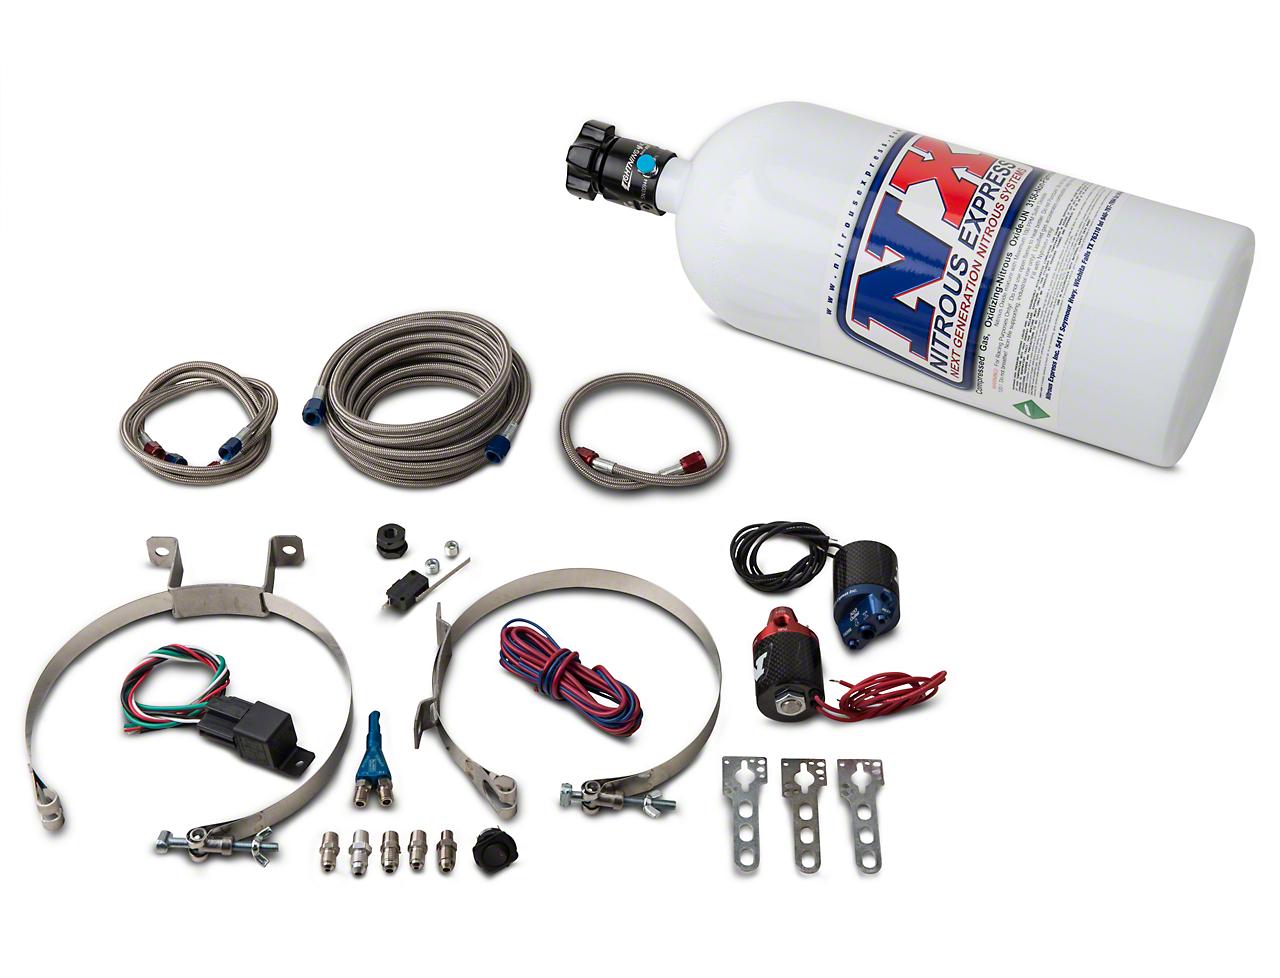 Nitrous Express Nitrous Kit - Nozzle System (86-04 GT)